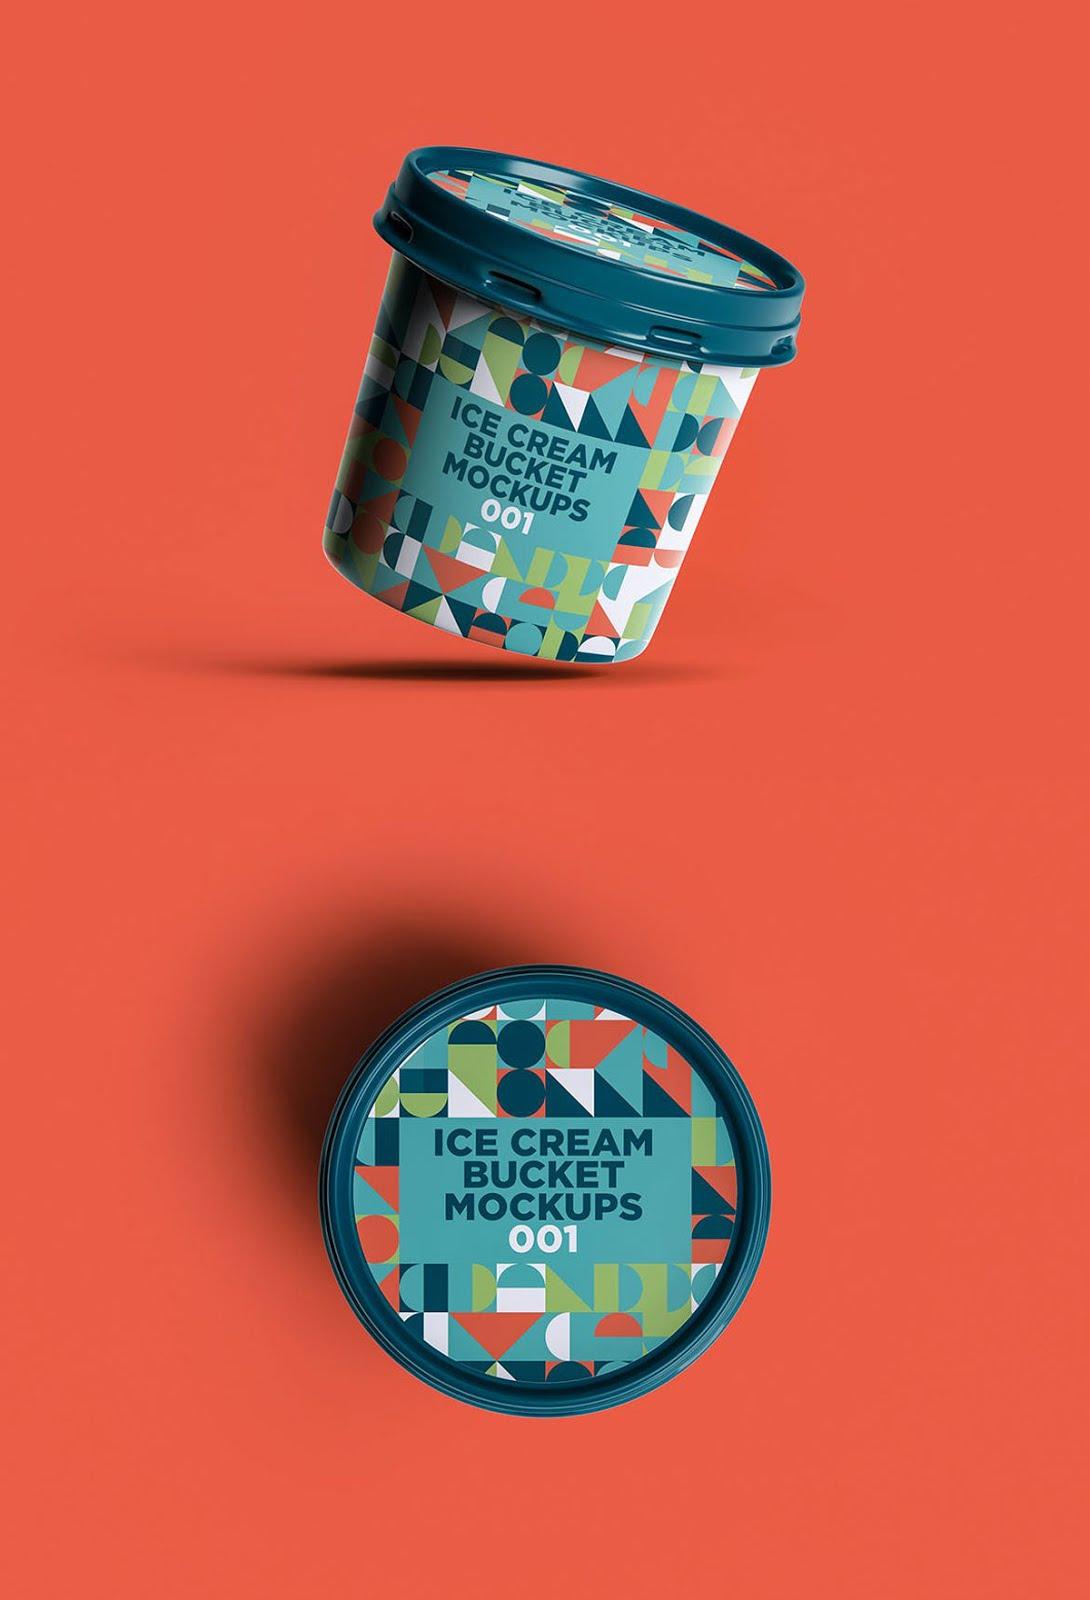 Ice Cream Bucket Mockups 001 Free Download